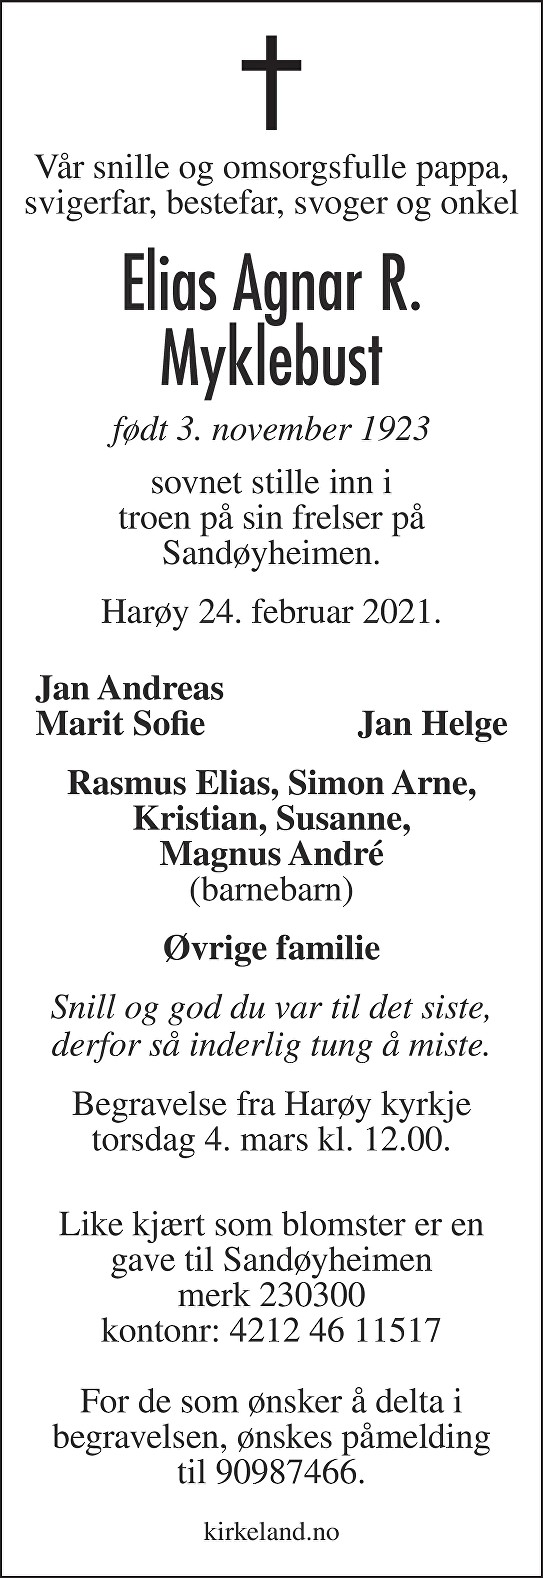 Elias Agnar R. Myklebust Dødsannonse